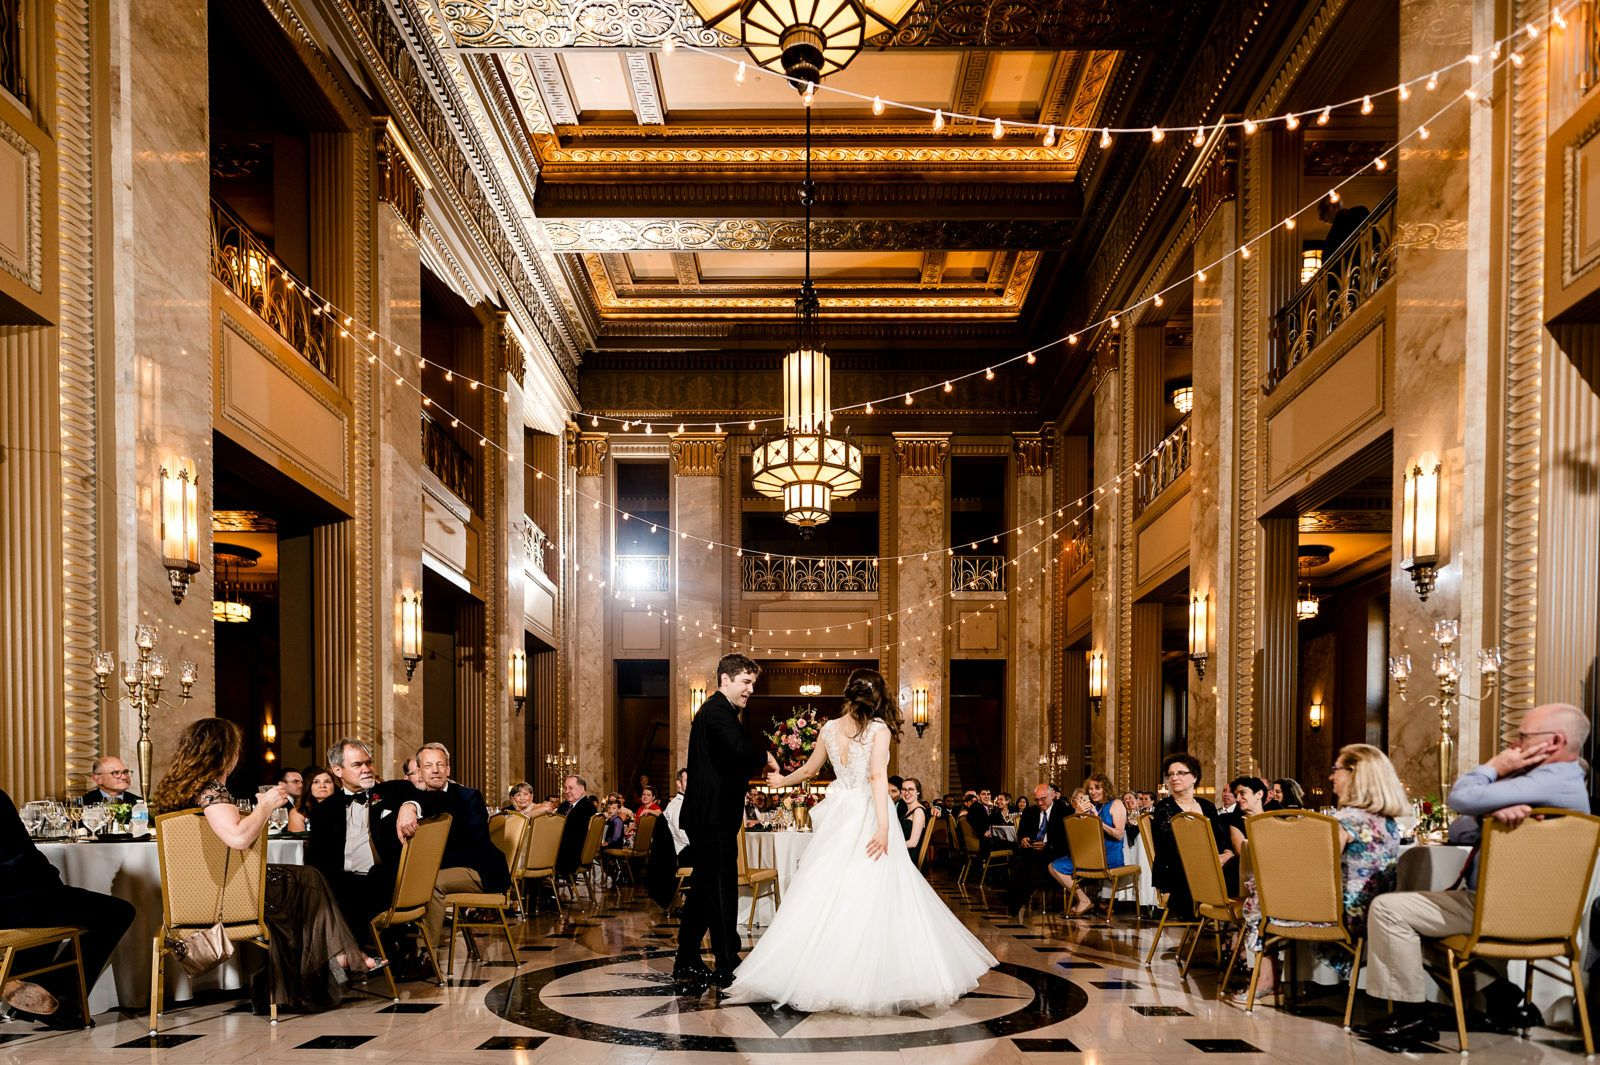 Saint Louis Wedding Photographer Stifel Theater Wedding Theatre Wedding St Louis Wedding St Louis Wedding Venues